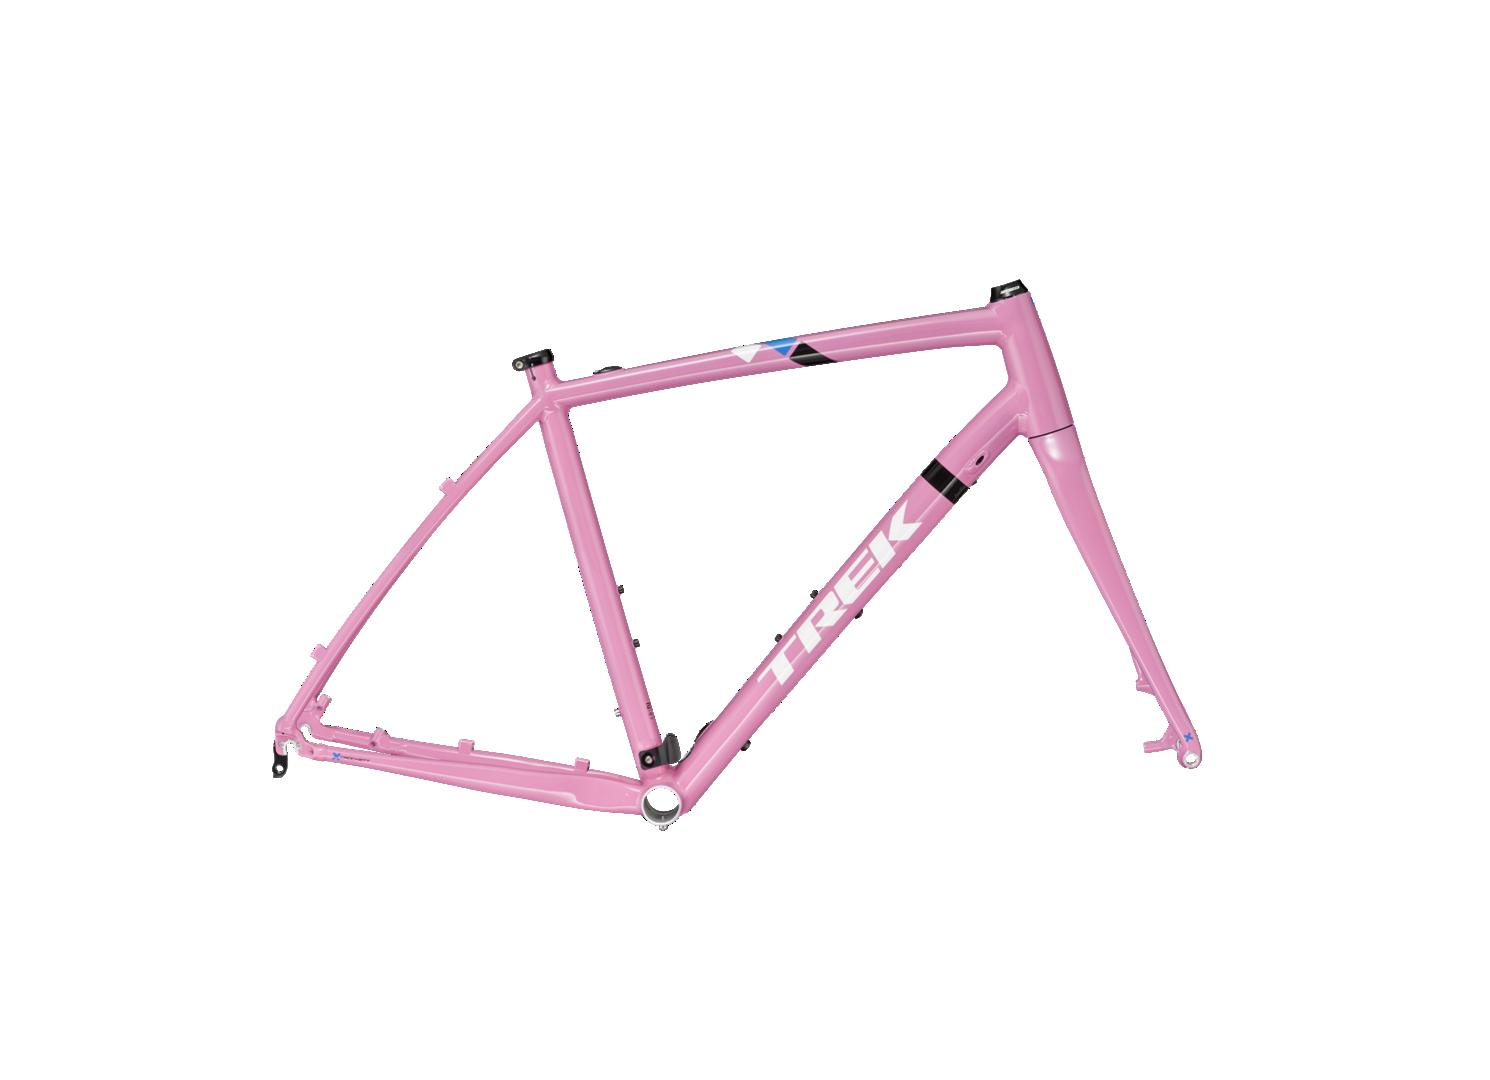 2016 Crockett Disc Frameset - Bike Archive - Trek Bicycle